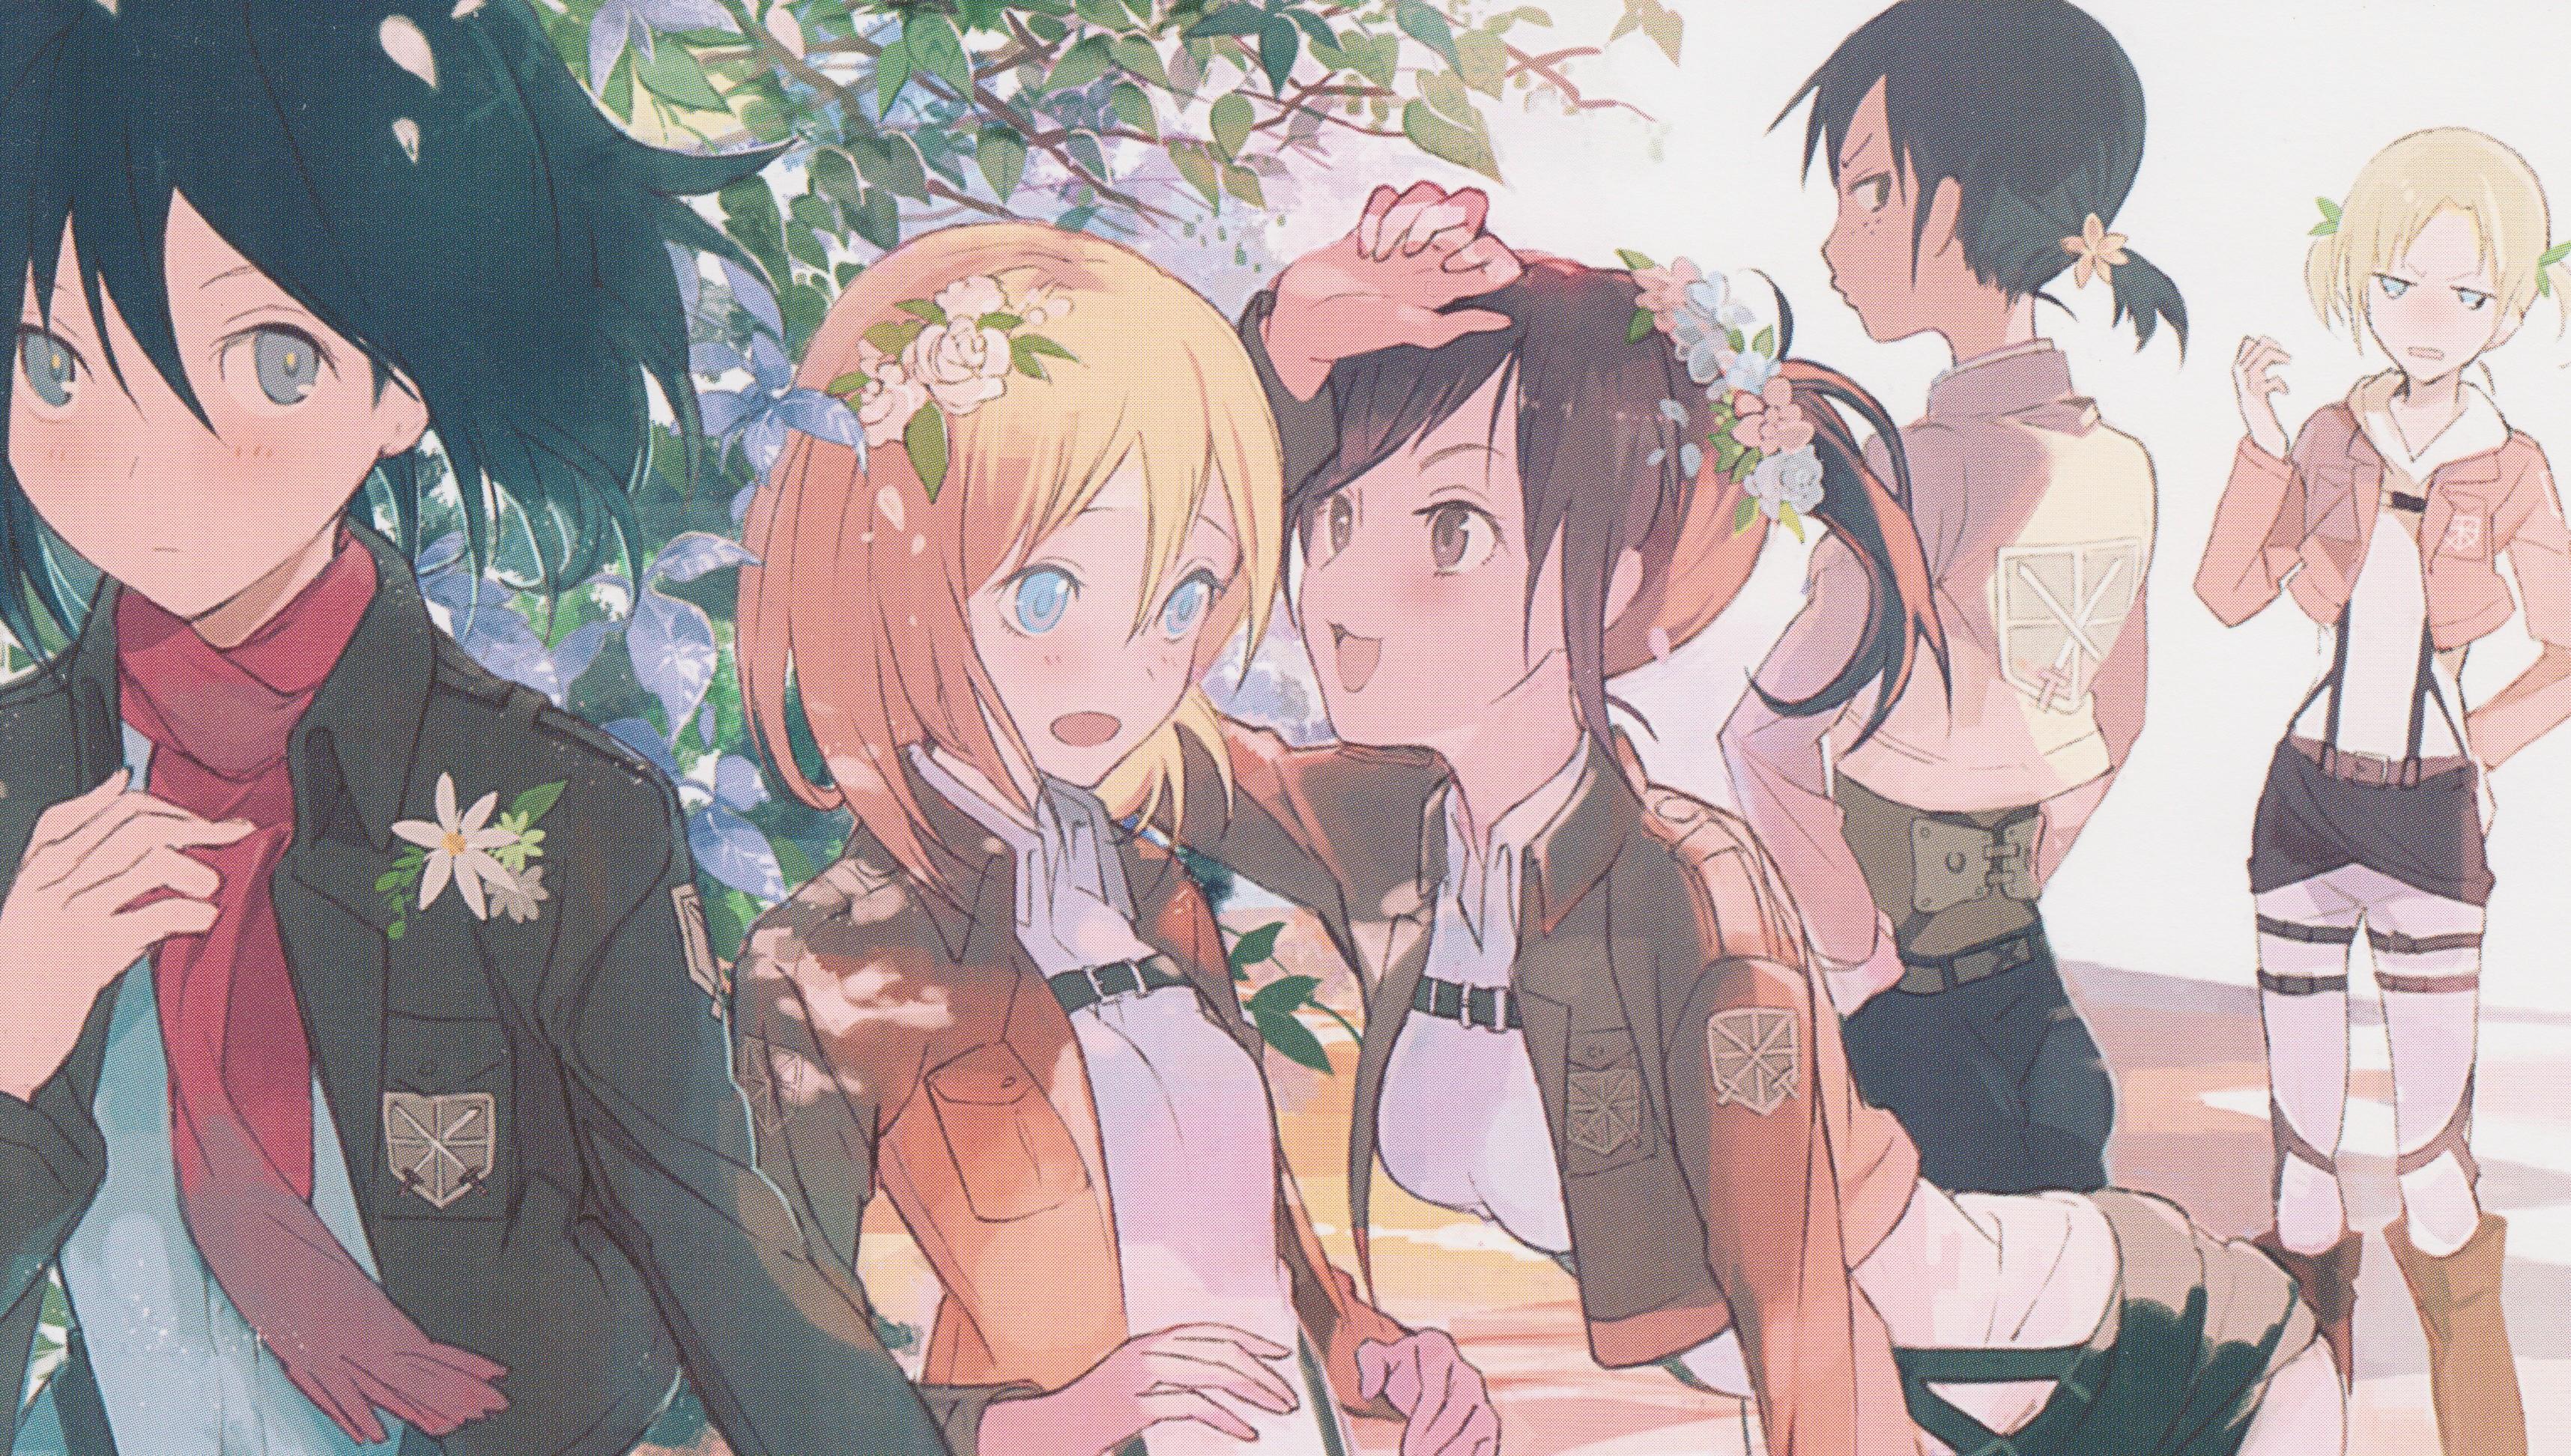 Shingeki No Kyojin Anime Girls Mikasa Ackerman Ymir Blouse Sasha Renz Christa Leonheart Annie Wallpaper Resolution 3432x1944 Id 404326 Wallha Com